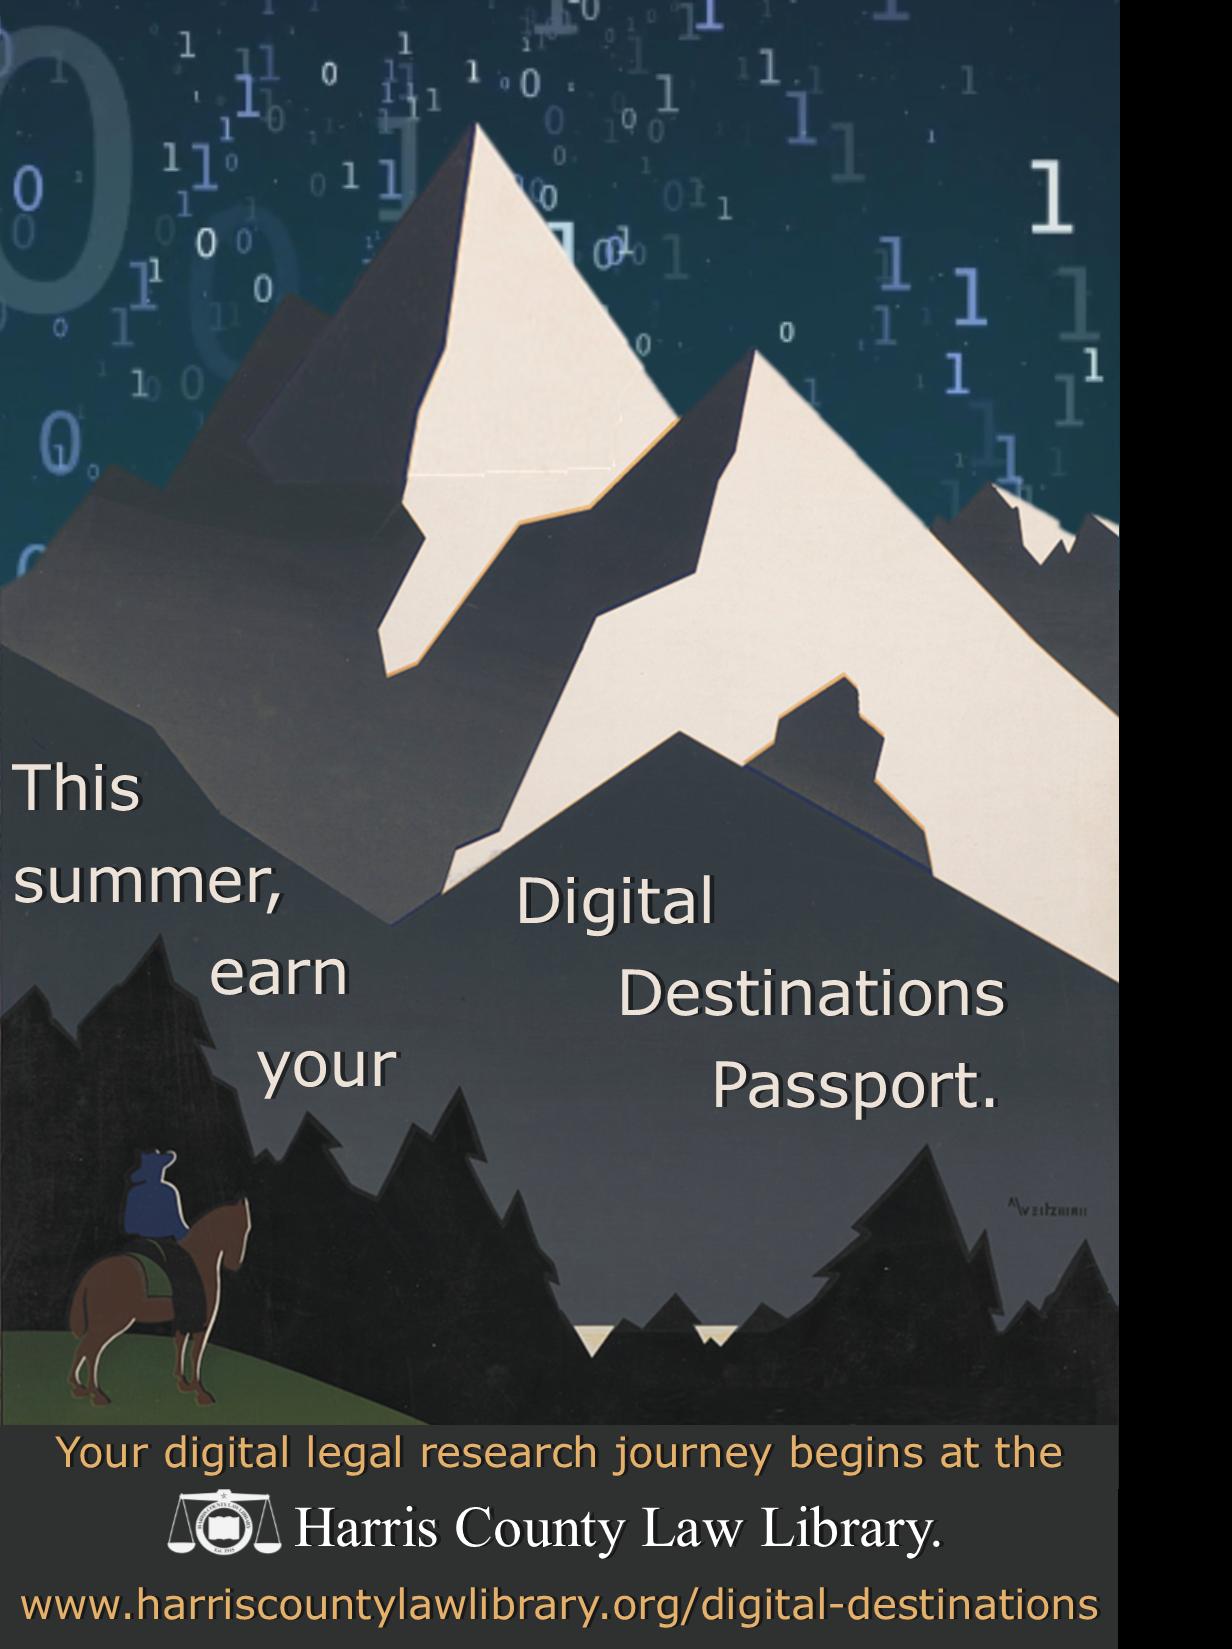 Click to view Digital Destinations Passport page.